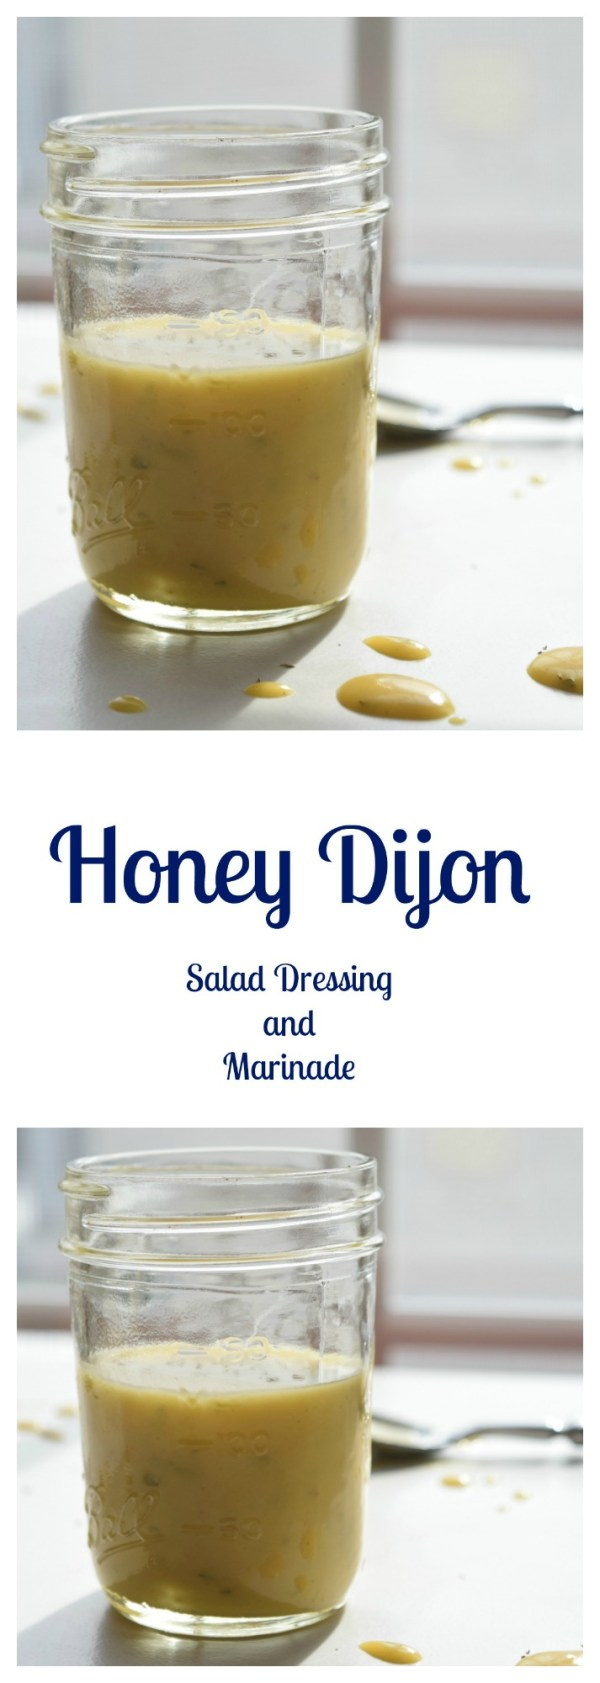 Honey Dijon Salad Dressing and Marinade Beer Girl Cooks